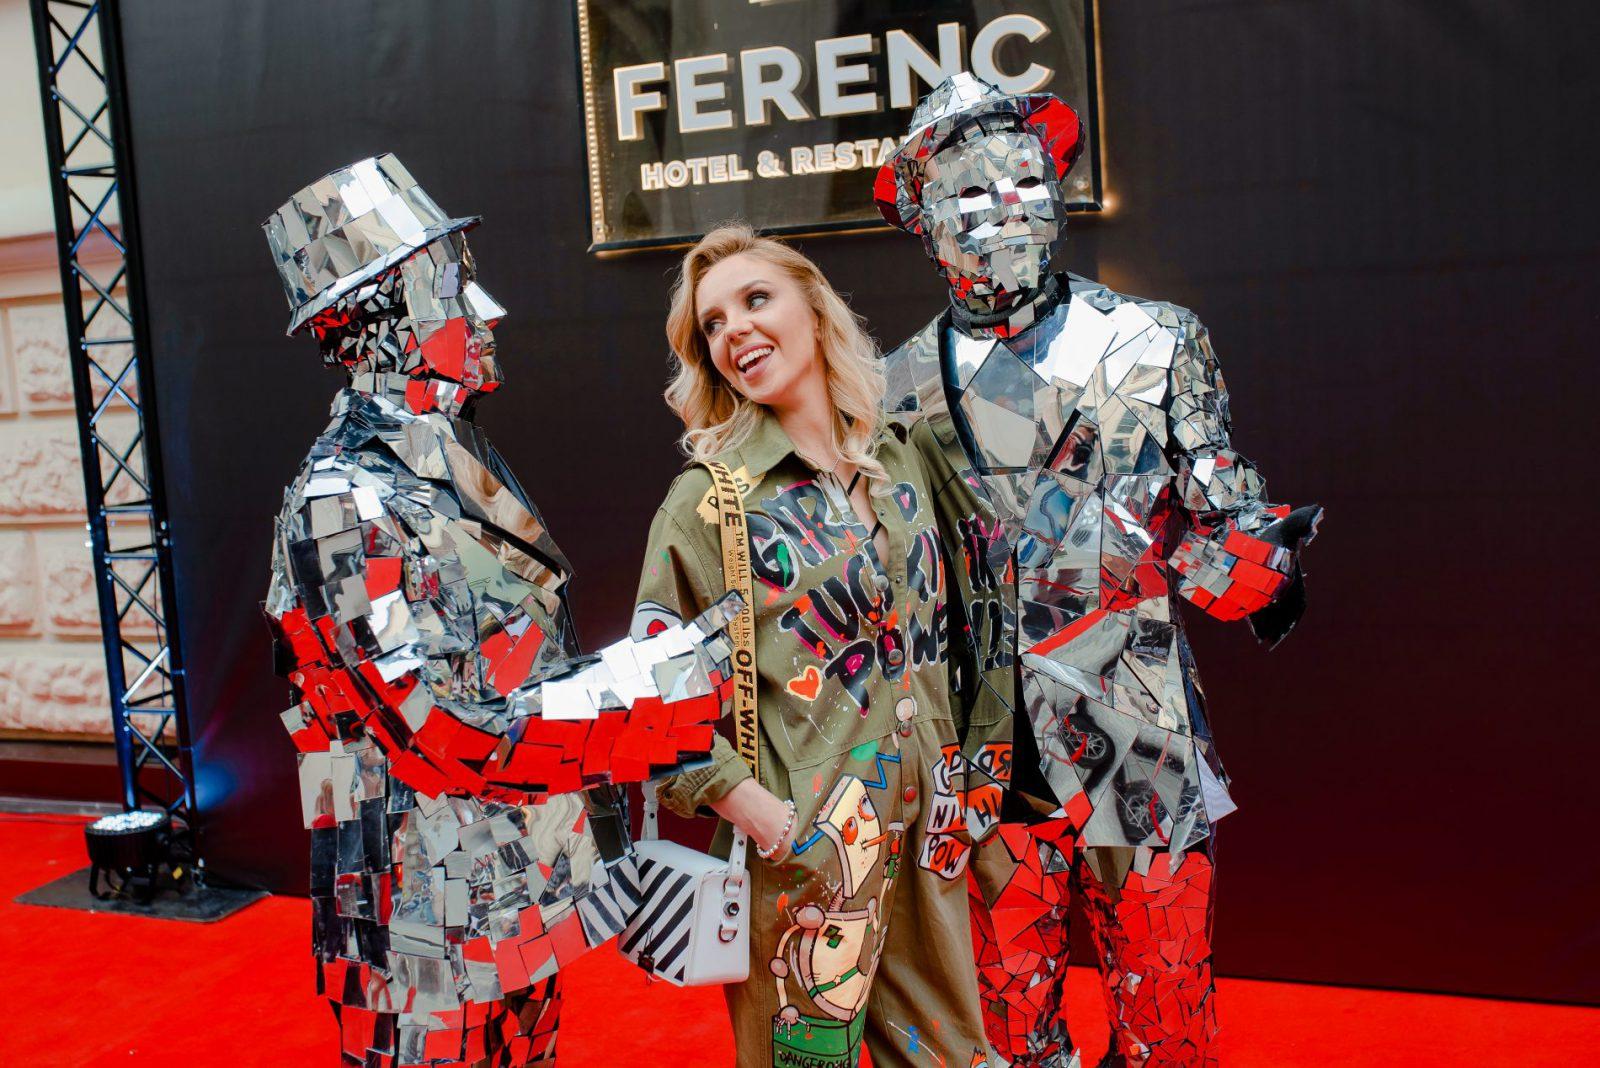 Ferenc0109